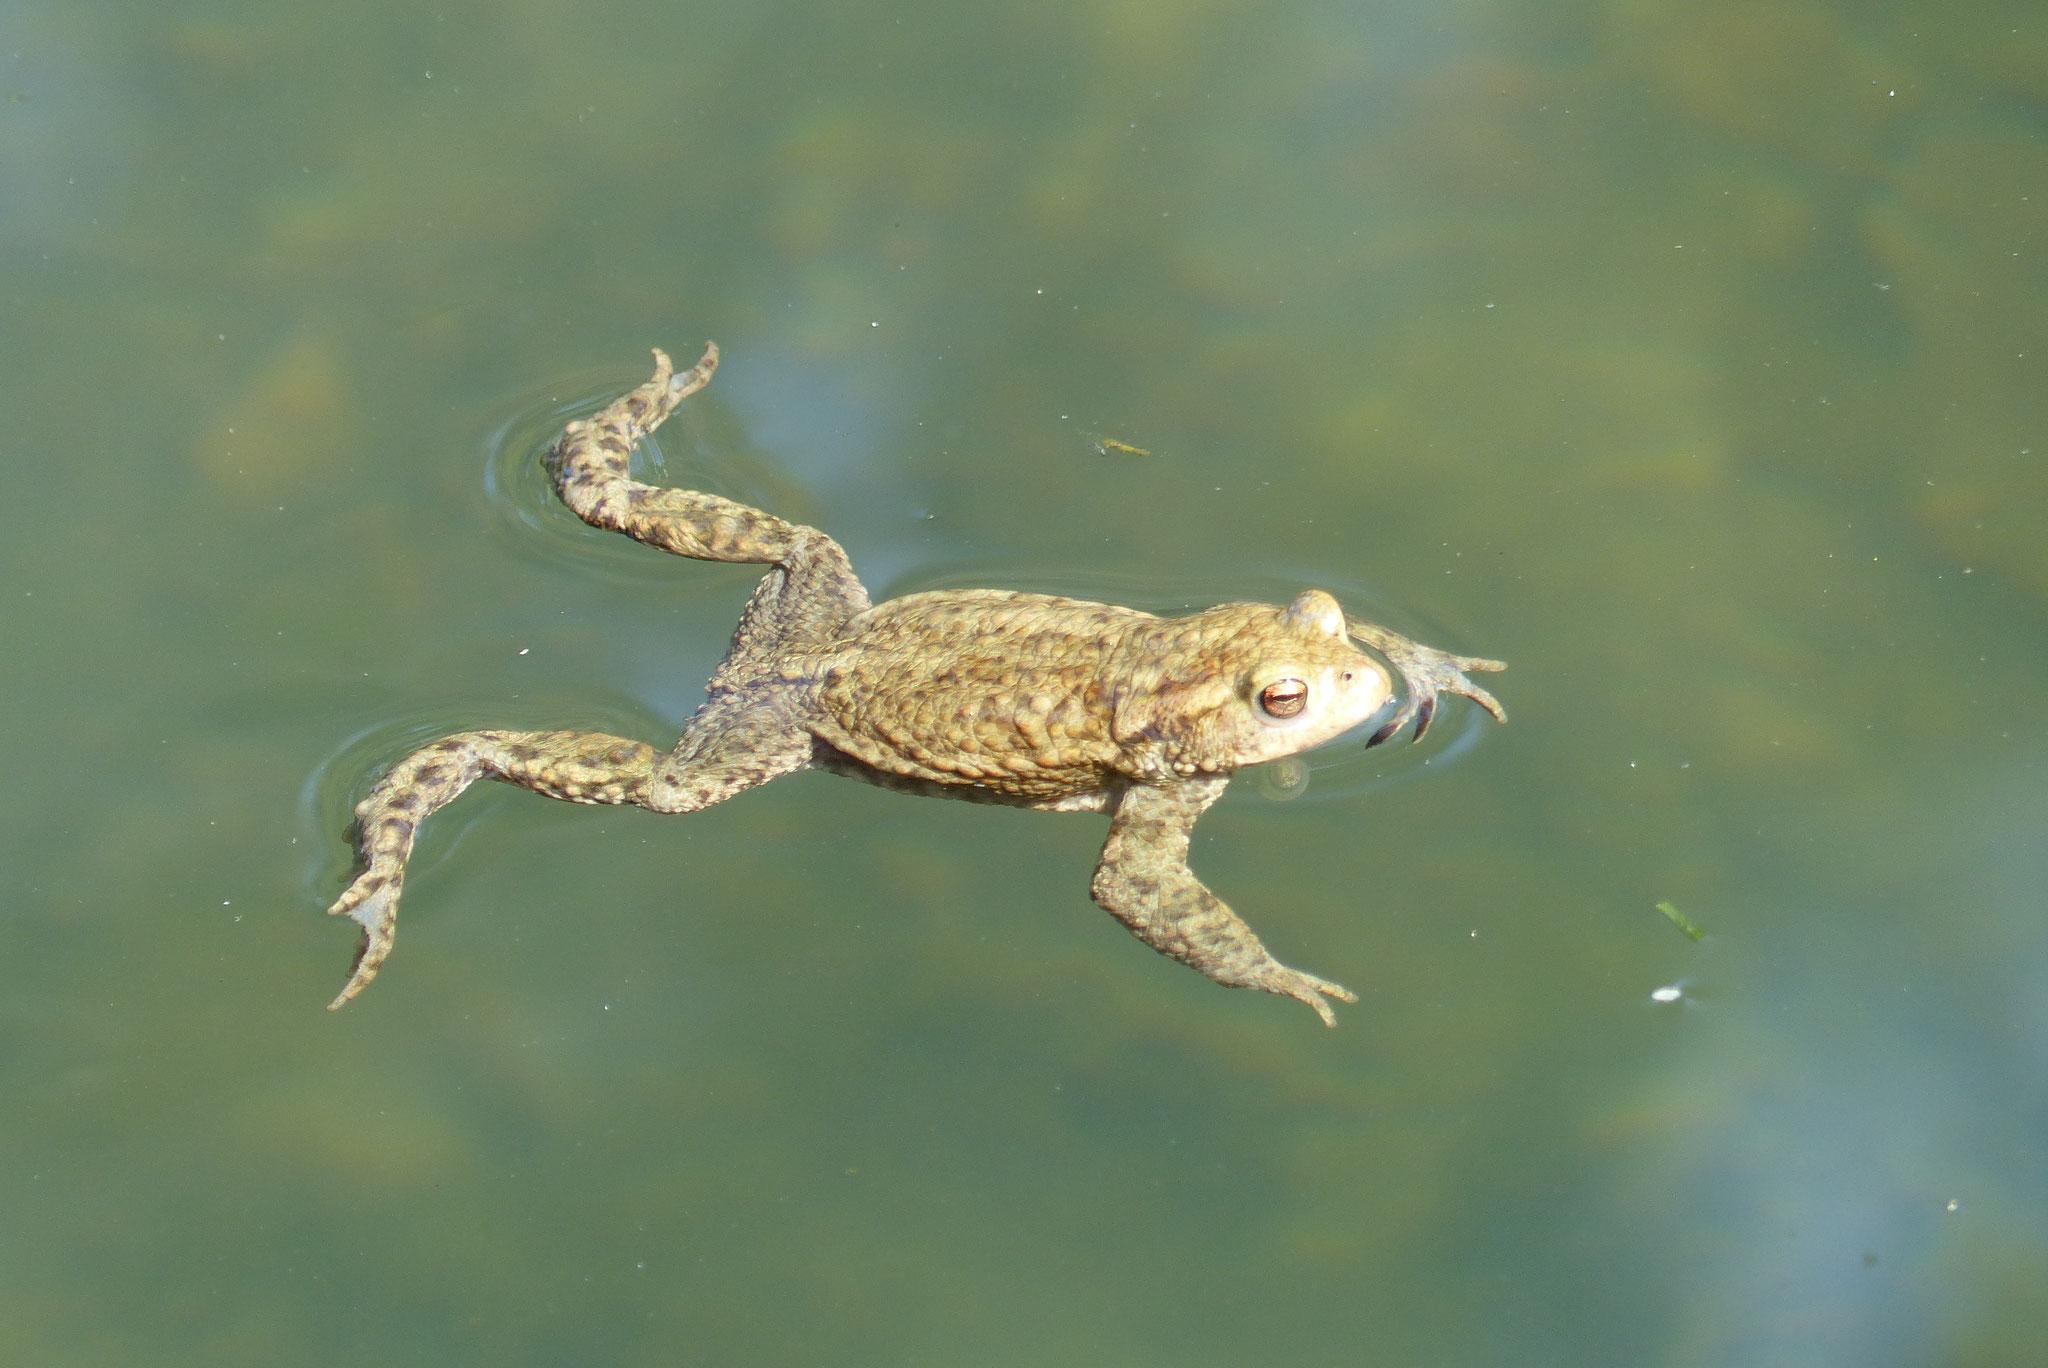 Erdkröte am Ziel der langen Wanderung (Foto: M. Wolschke)